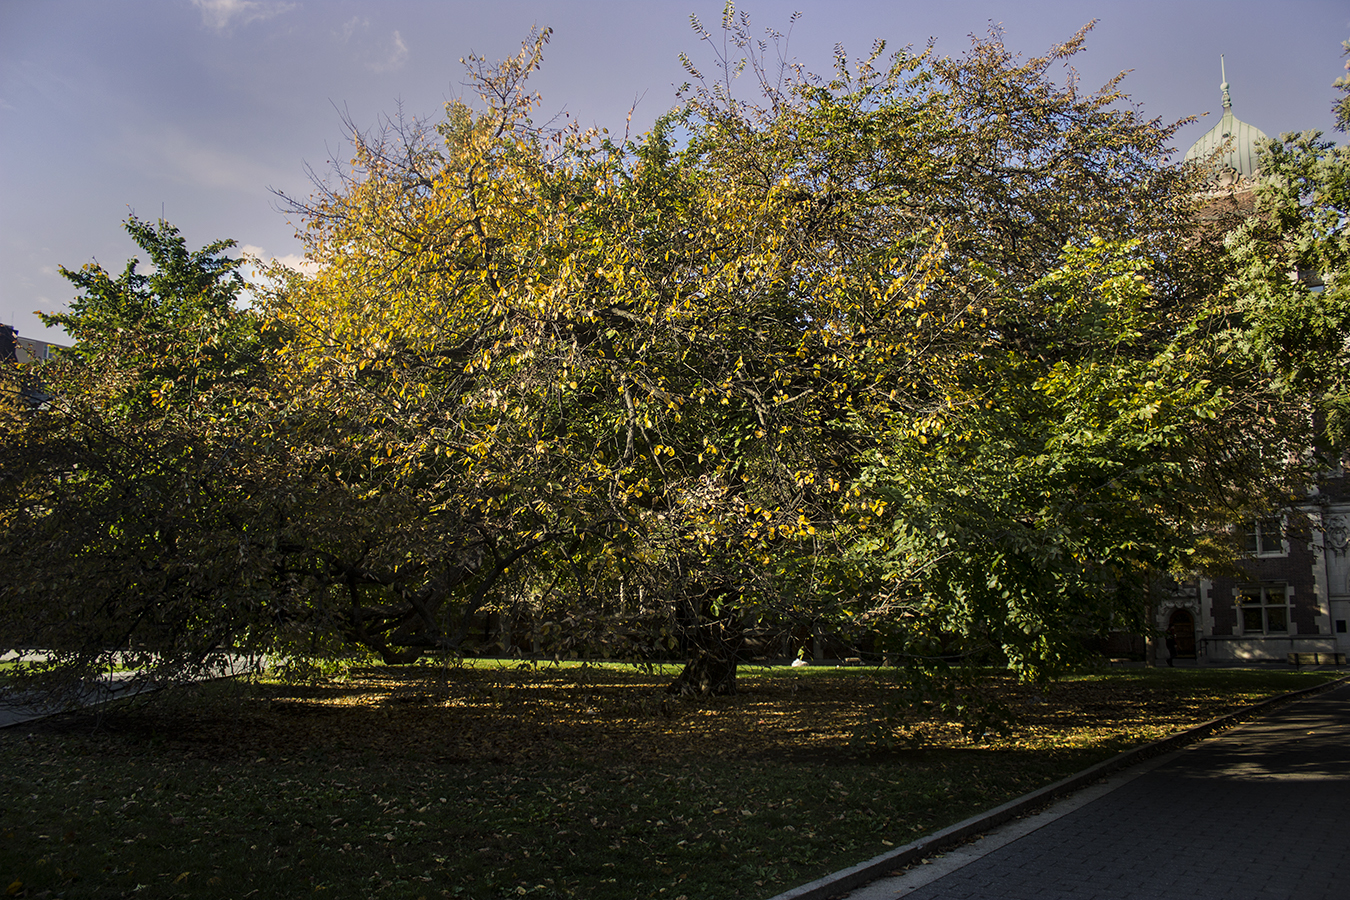 Yash Killa_StillLife_Philadelphia_Pattern_Repetition_Tree_Leaves_Green_Shadow_Spring